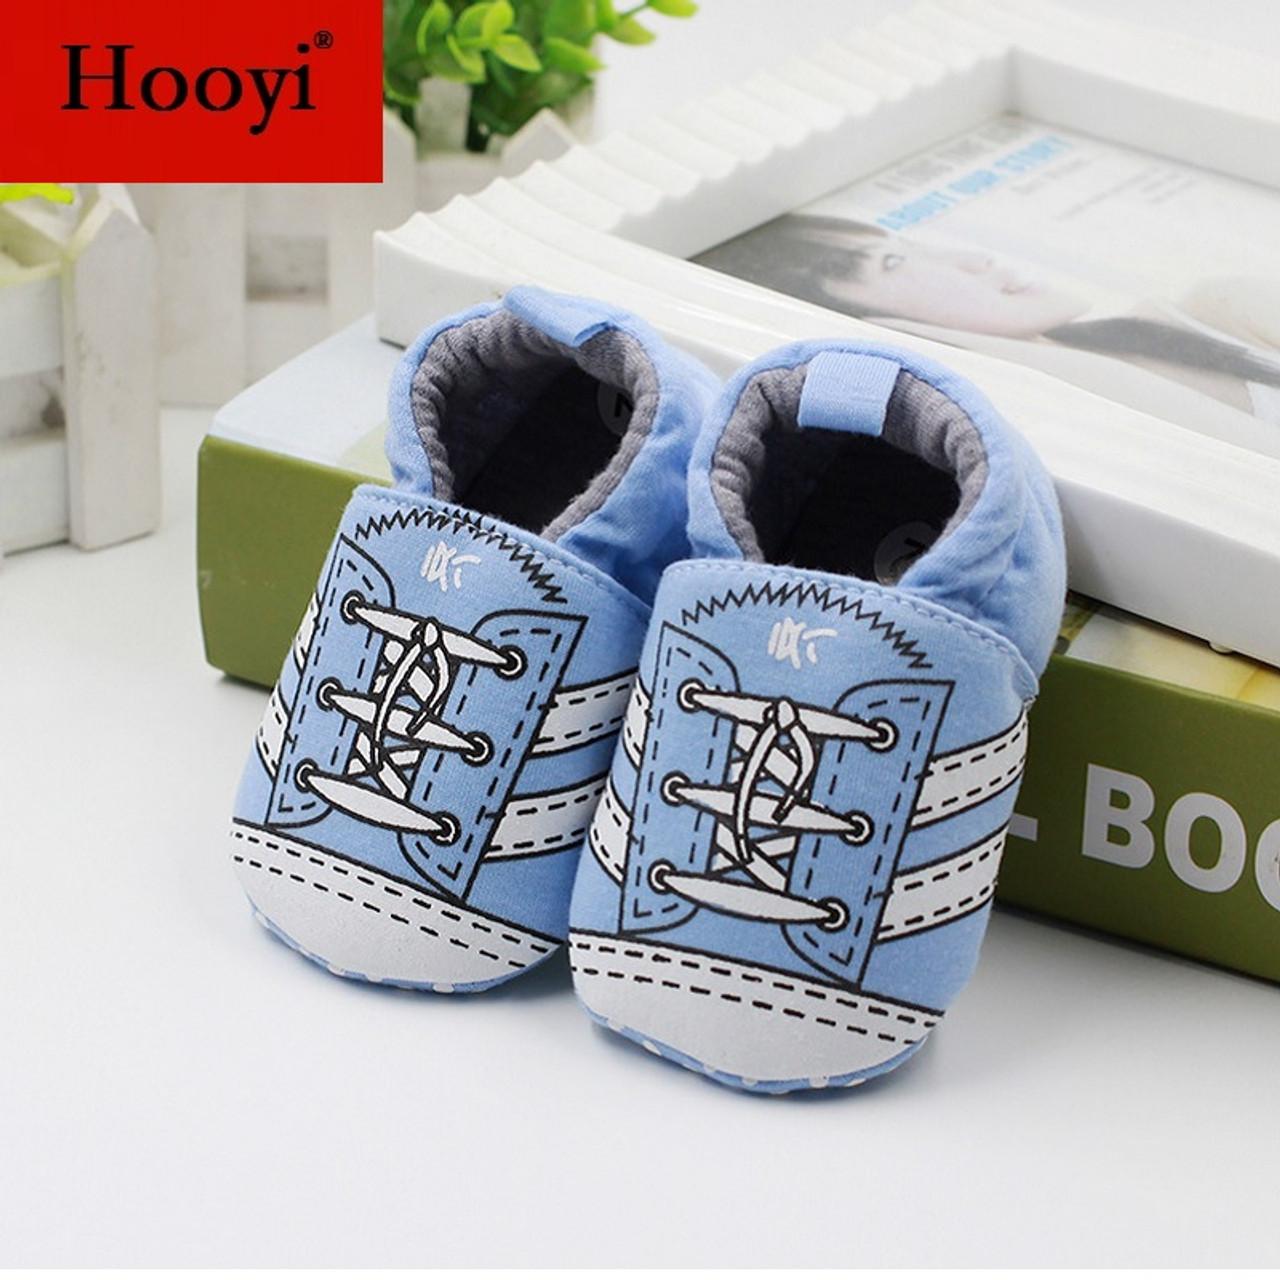 66eac06f9bbec ... Giraffe Hooyi Baby Boy Shoes Anti-Slip Newborn Shoe Cotton Children  Sneakers Toddler First Walkers ...